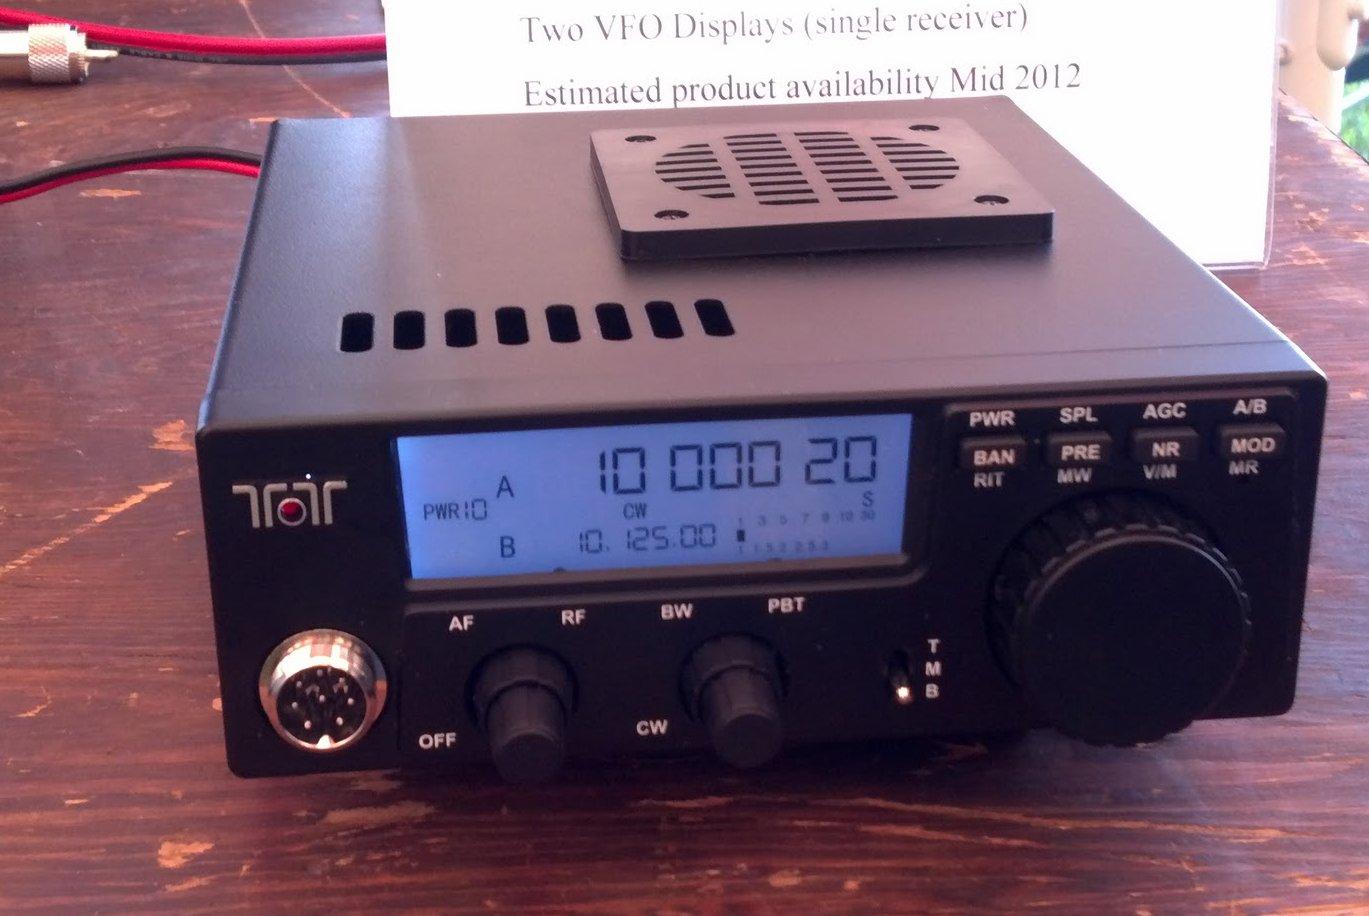 A review of Ten-Tec's Argonaut VI QRP transceiver, Model 539 | Q R P e r